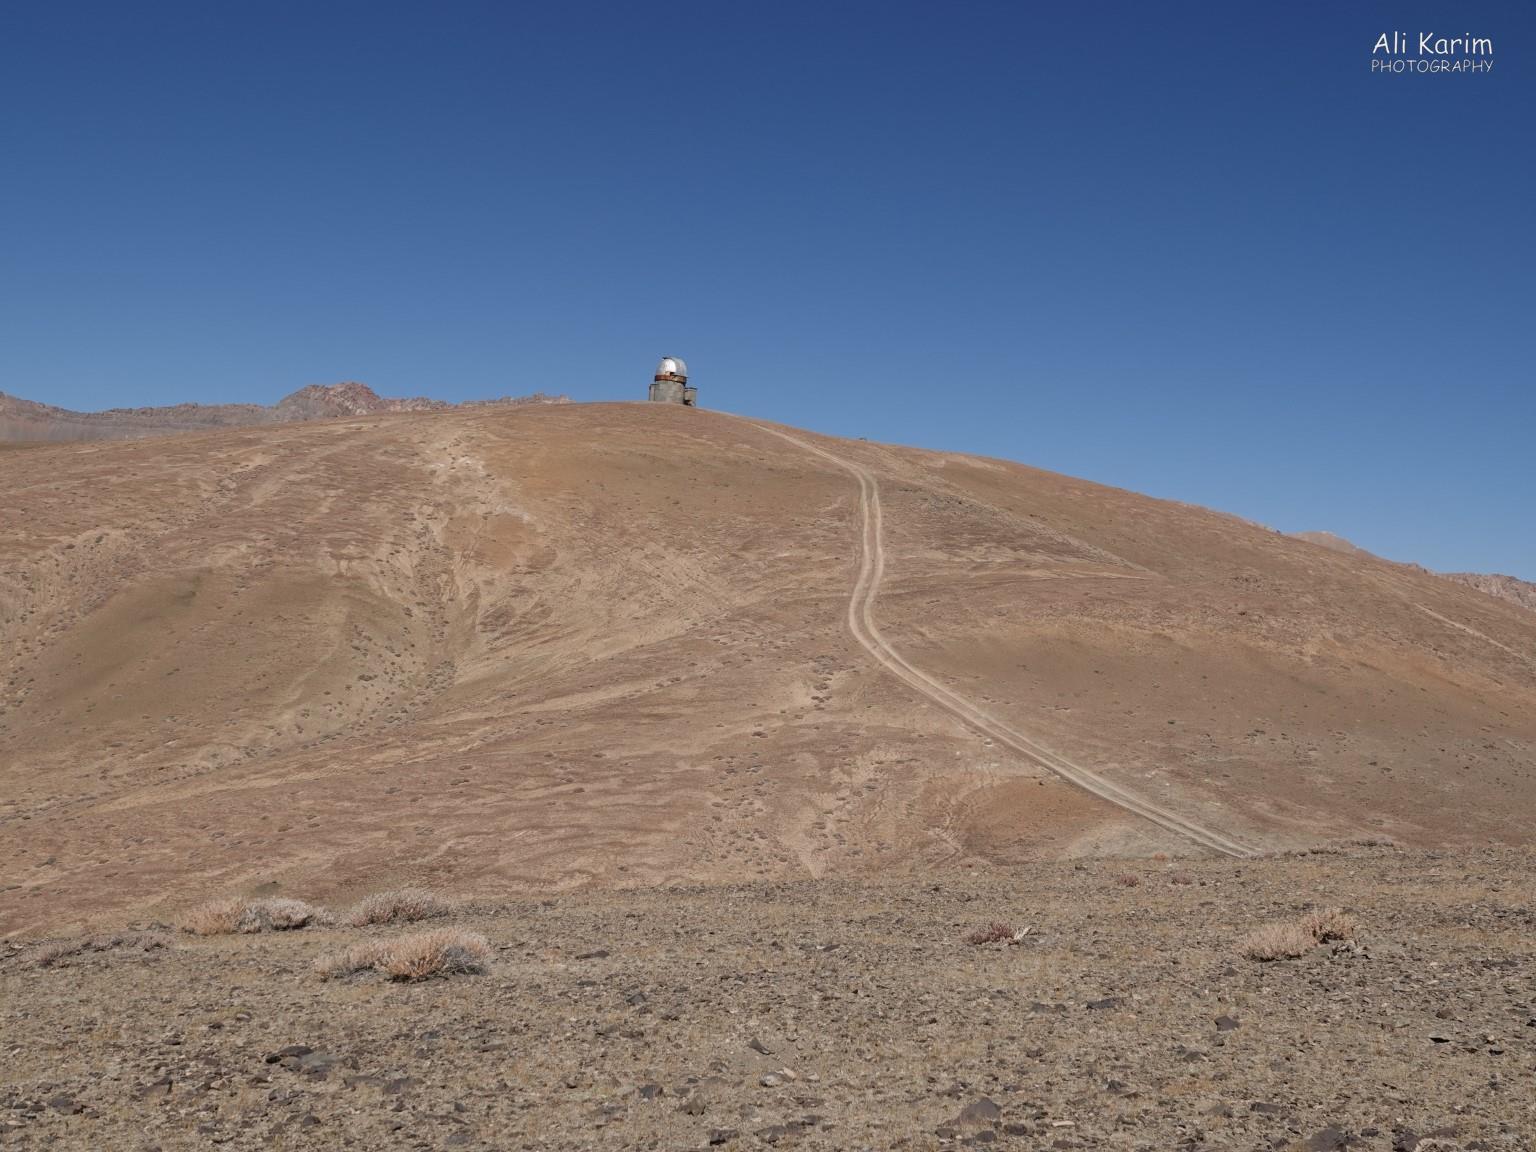 More Murghab & Alichur, Tajikistan, Arriving at Shorbulak (or Shor-Buloq) Observatory